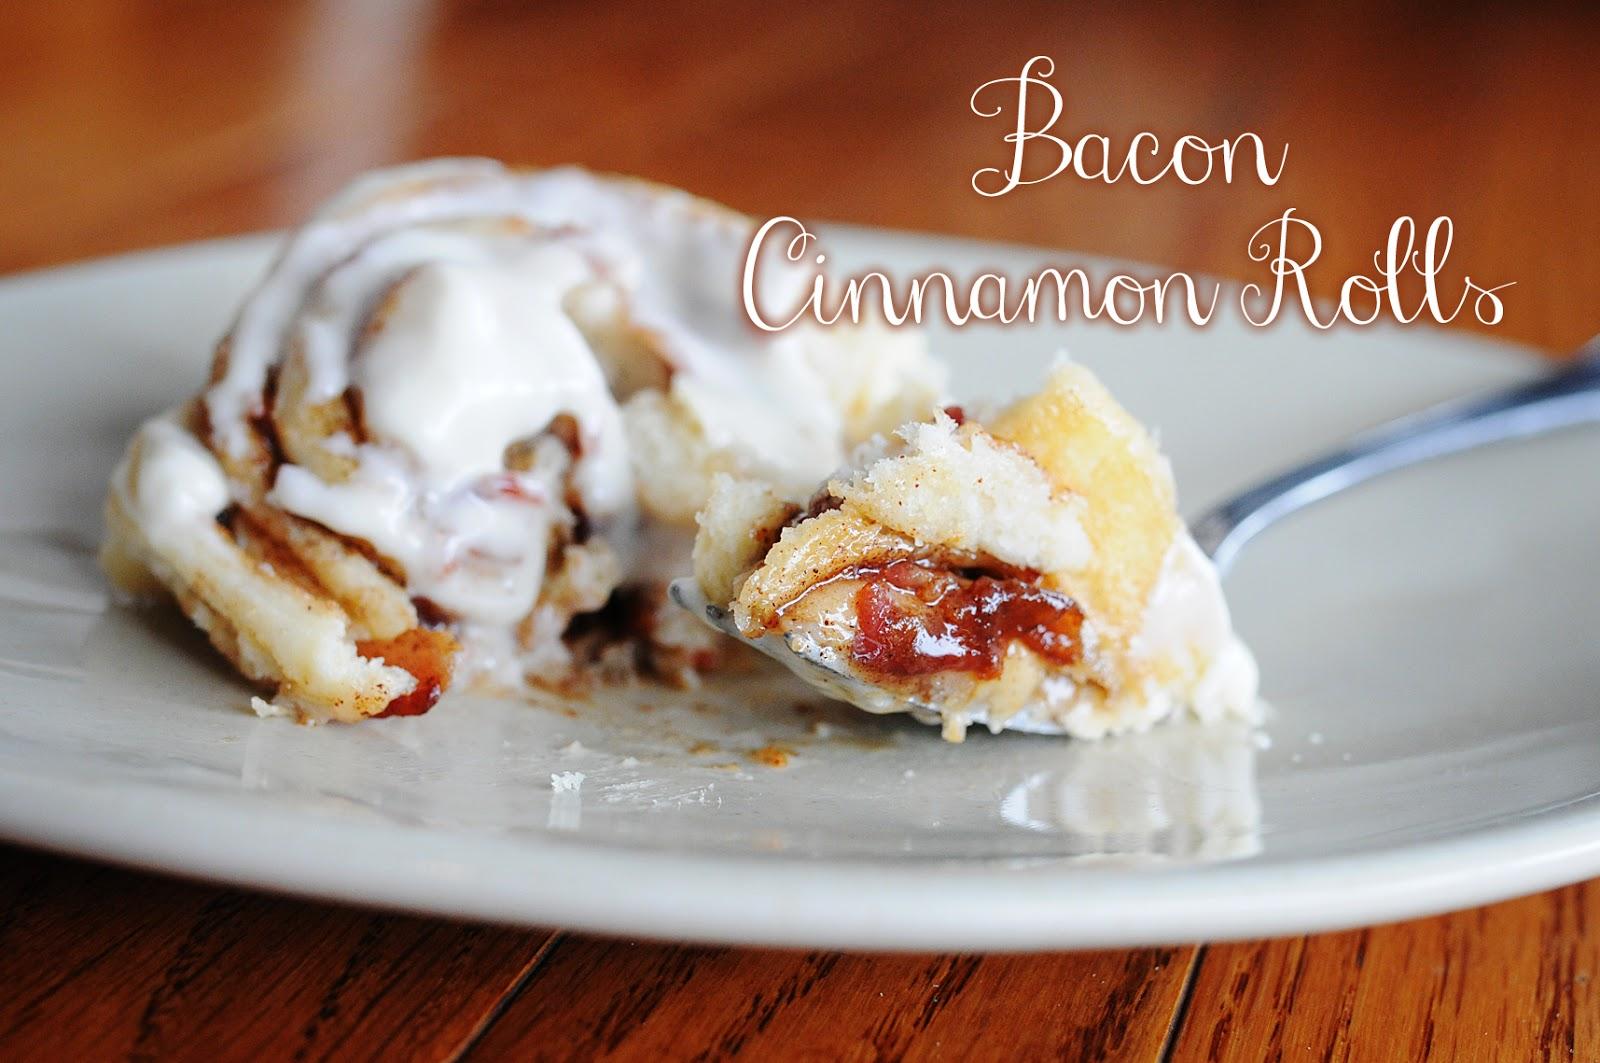 how to make bacon cinnamon rolls